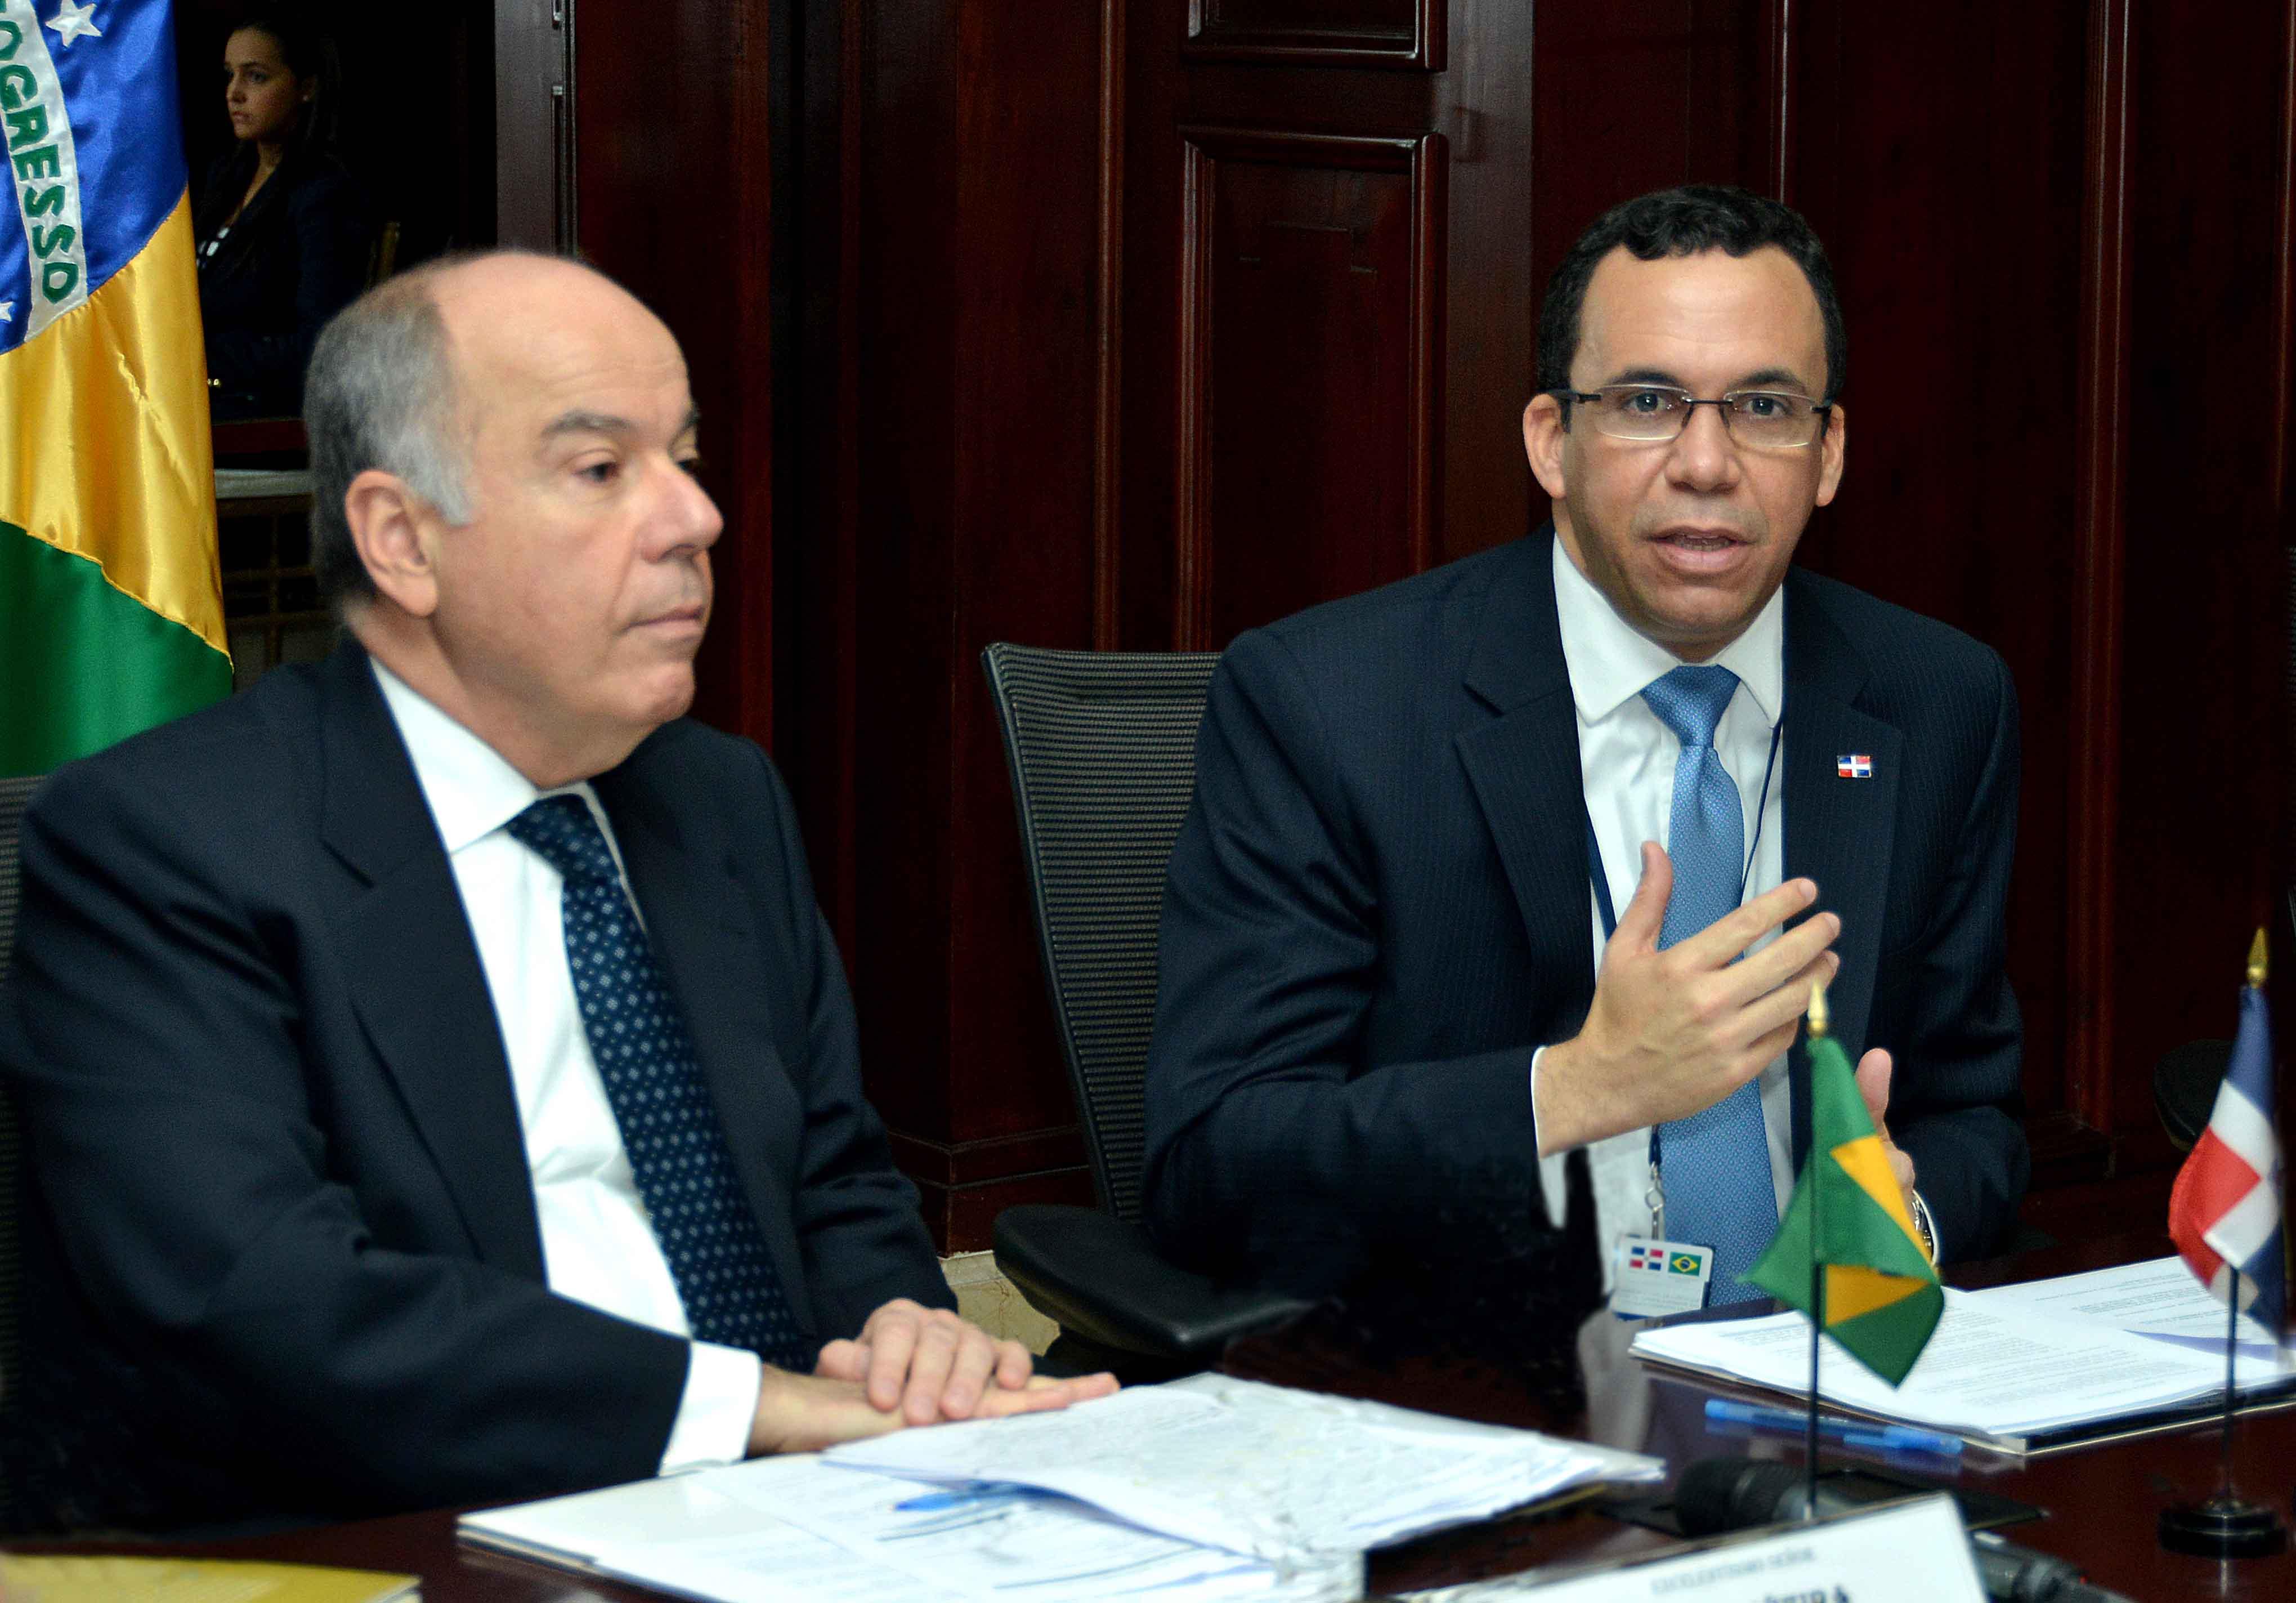 Cancilleres de RD y Brasil acuerdan profundizar diálogo político bilateral